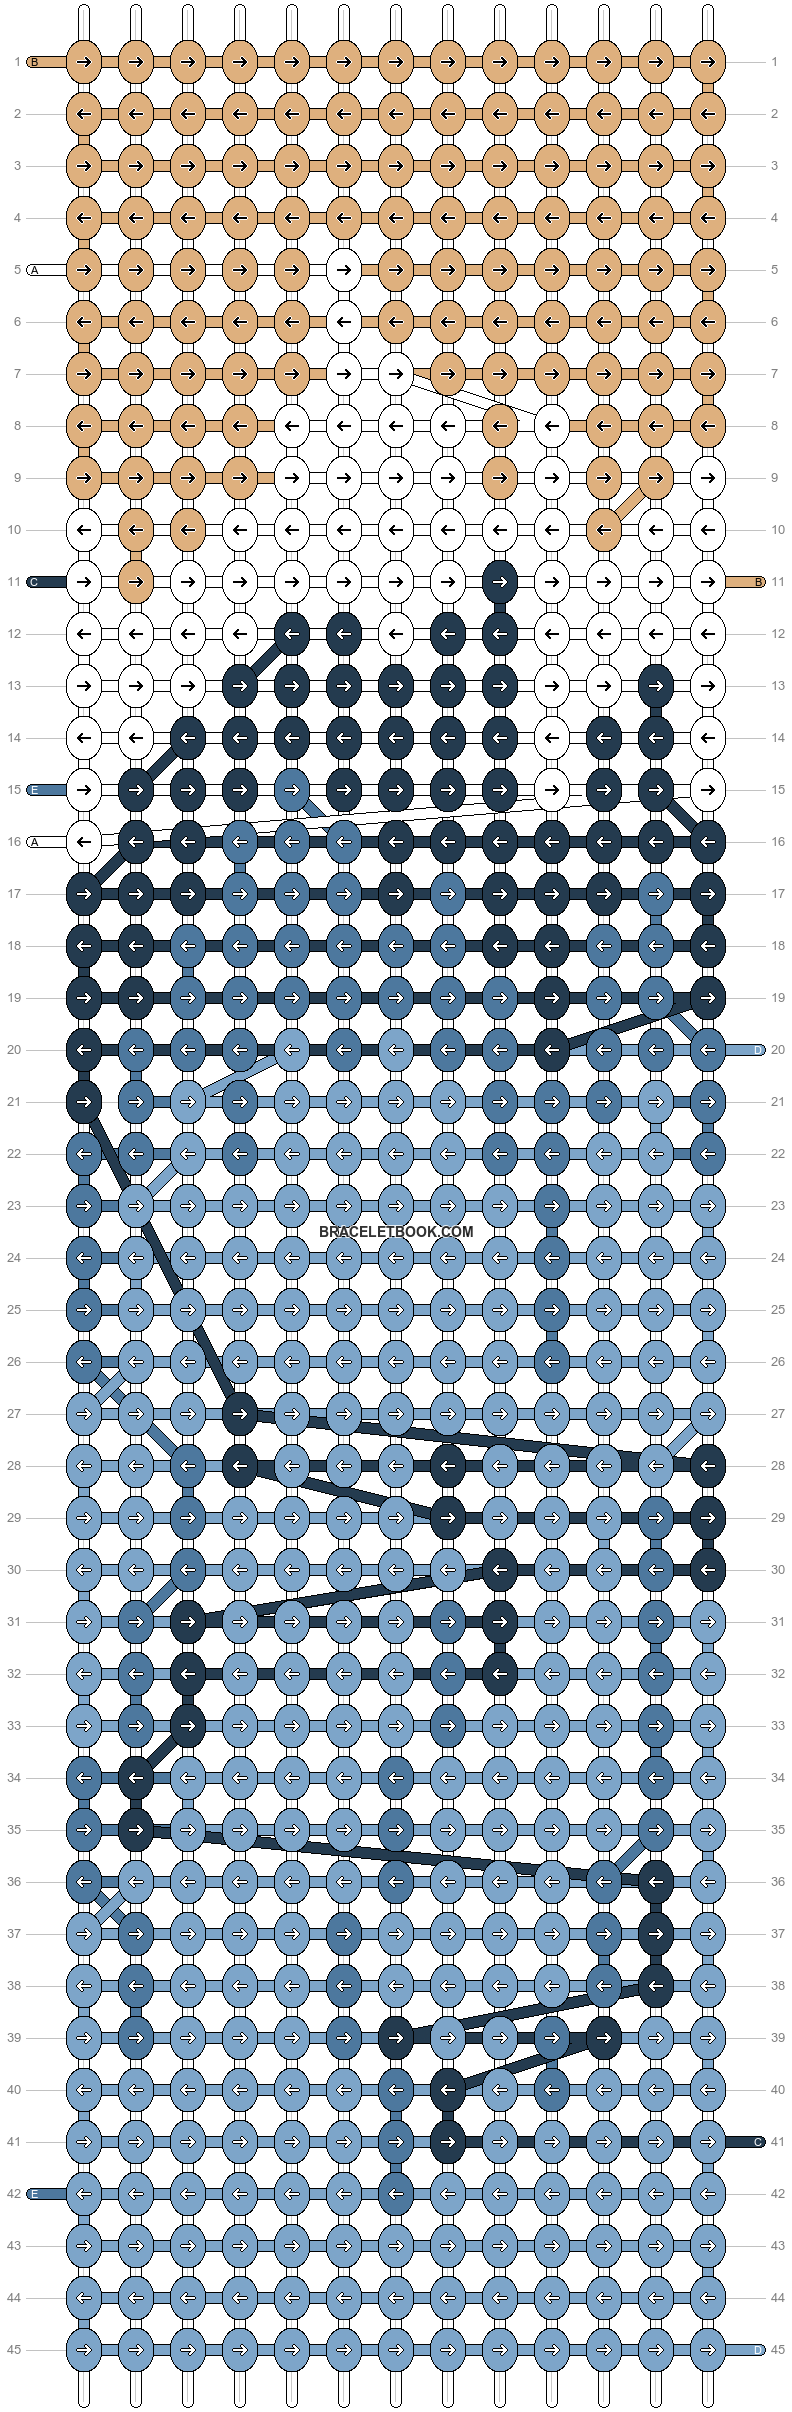 Alpha pattern #61853 pattern